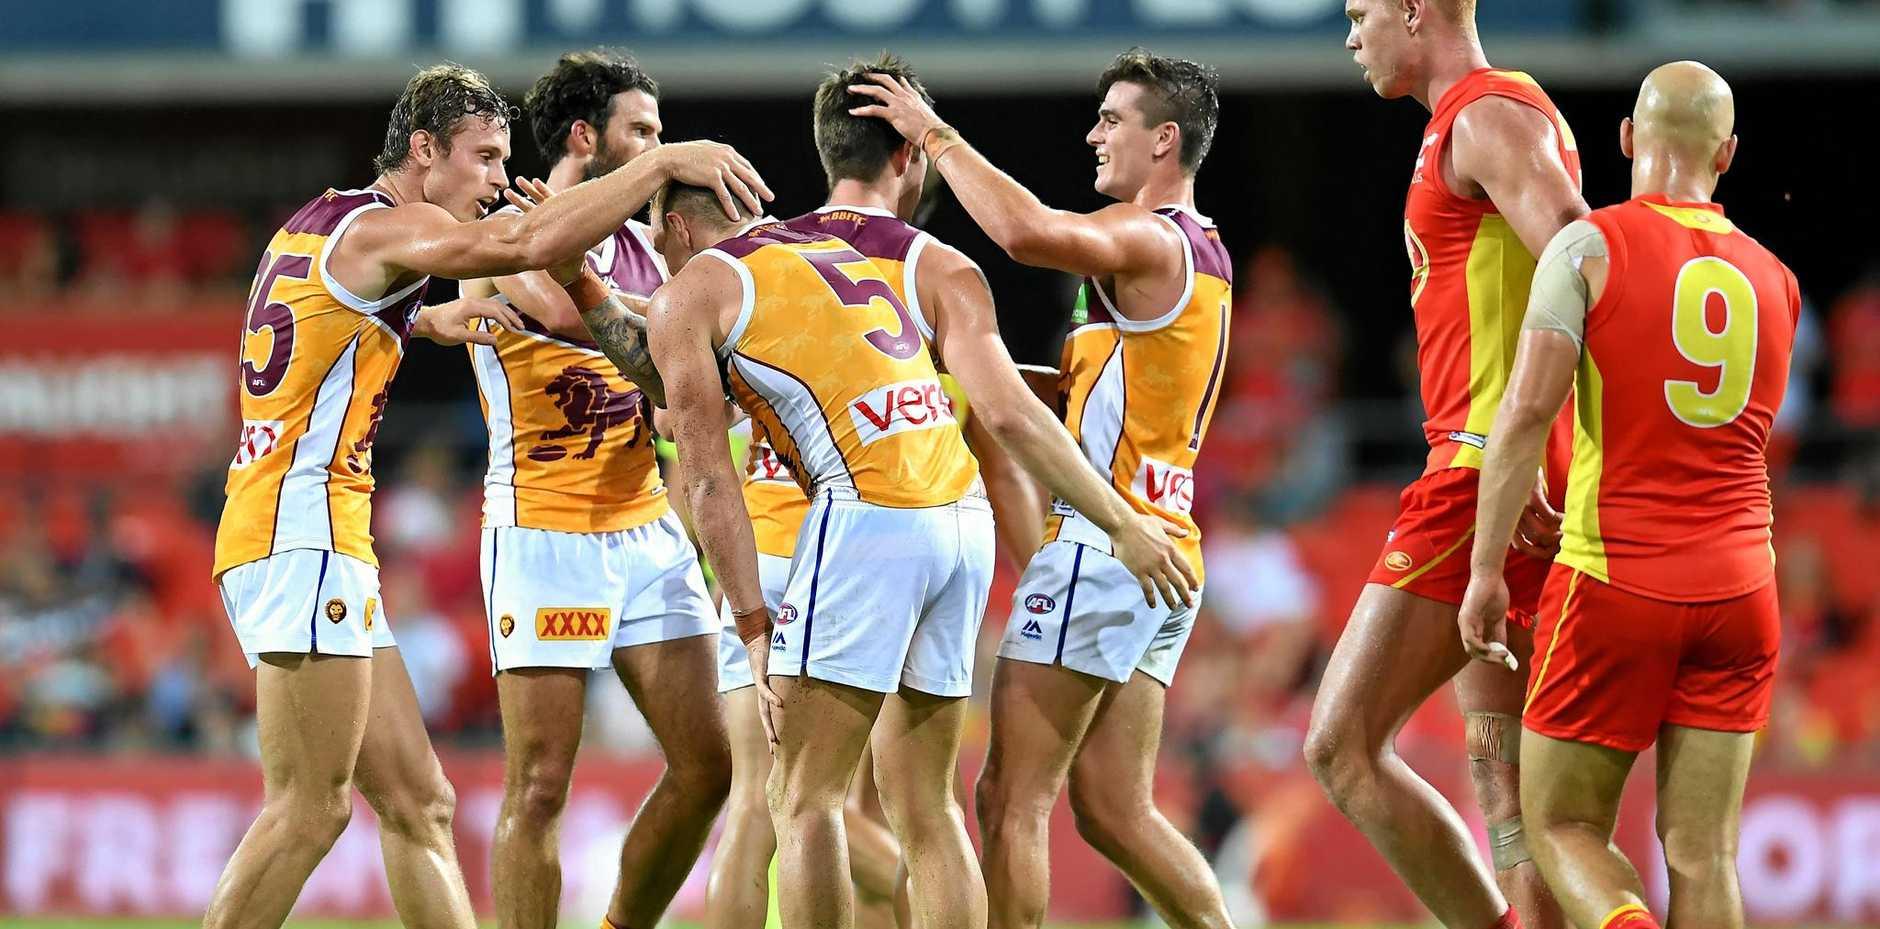 Brisbane Lions players celebrate scoring a goal